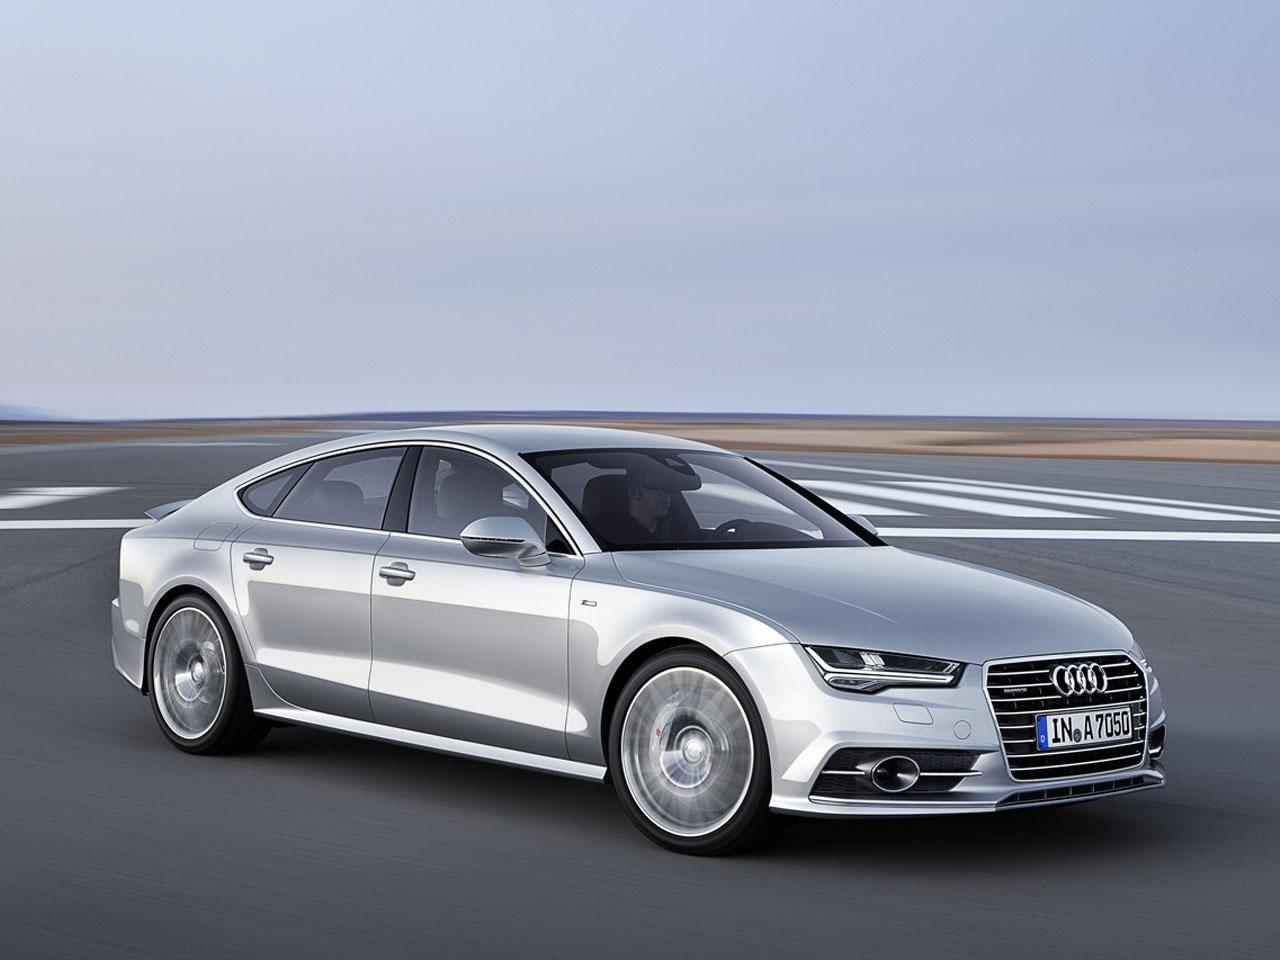 New Audi A Sportback Unveiled CarCostCanada - Audi a7 invoice price